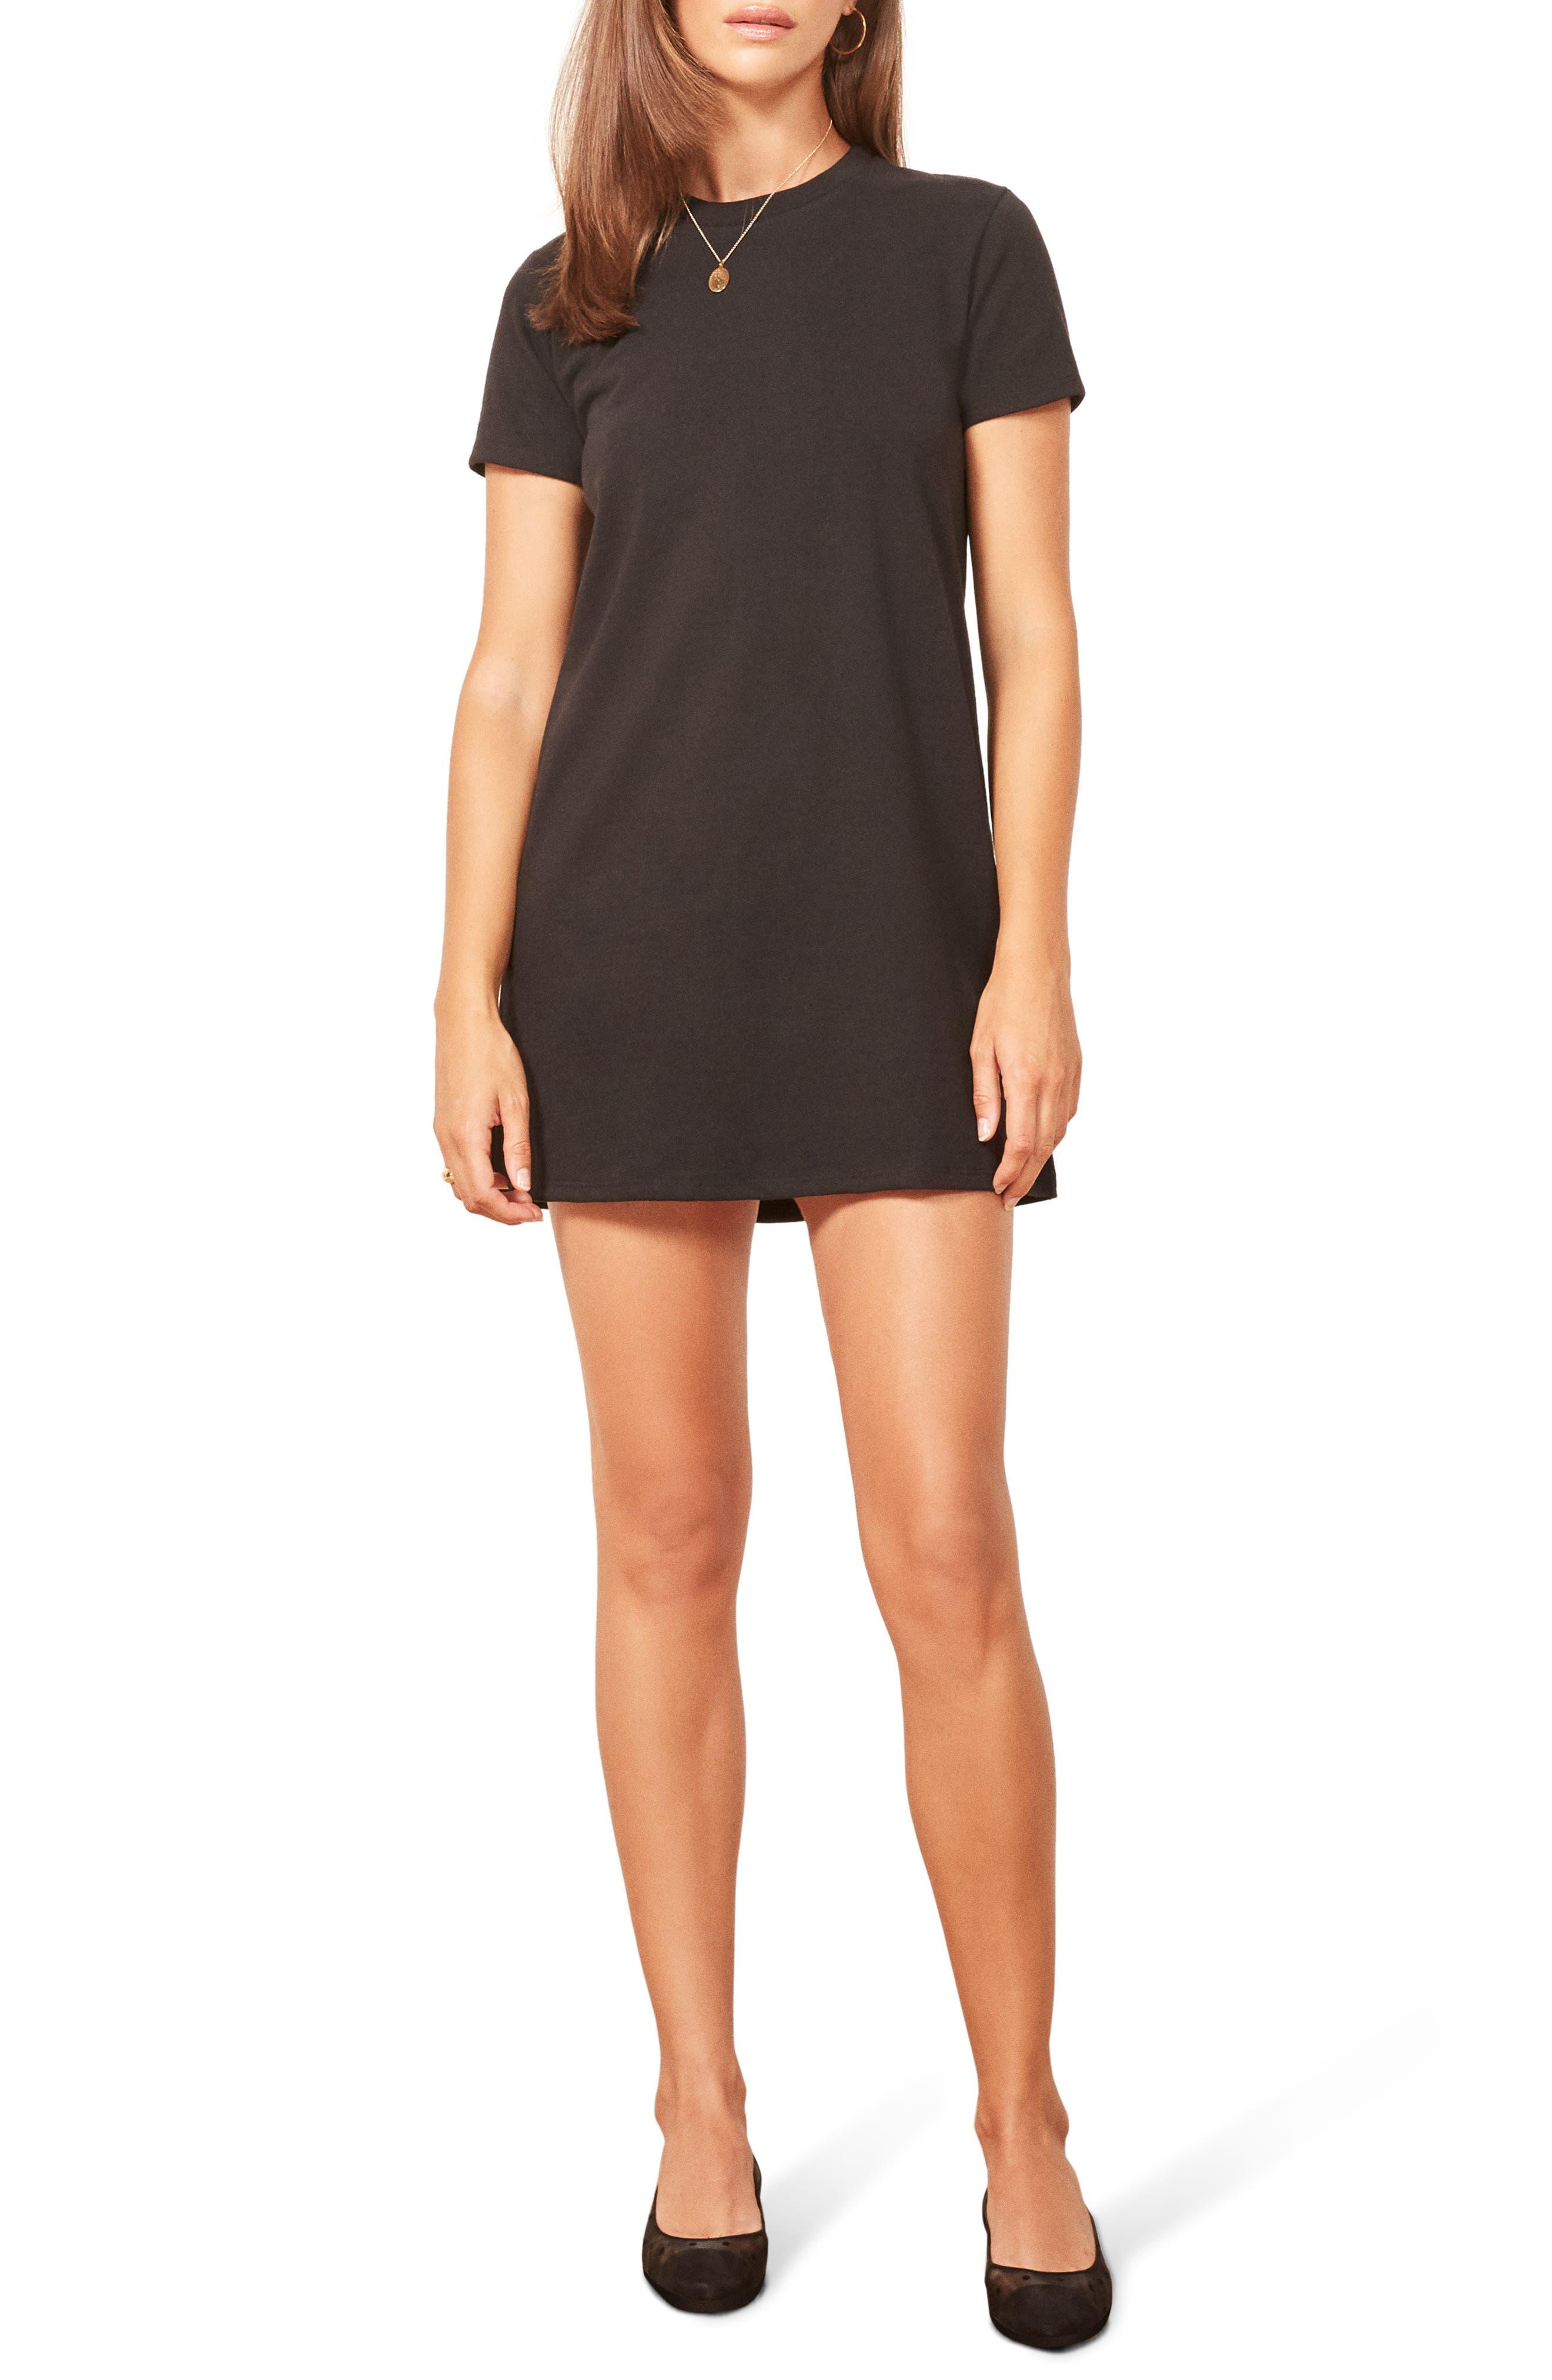 Damien T-Shirt Dress,                             Main thumbnail 1, color,                             001